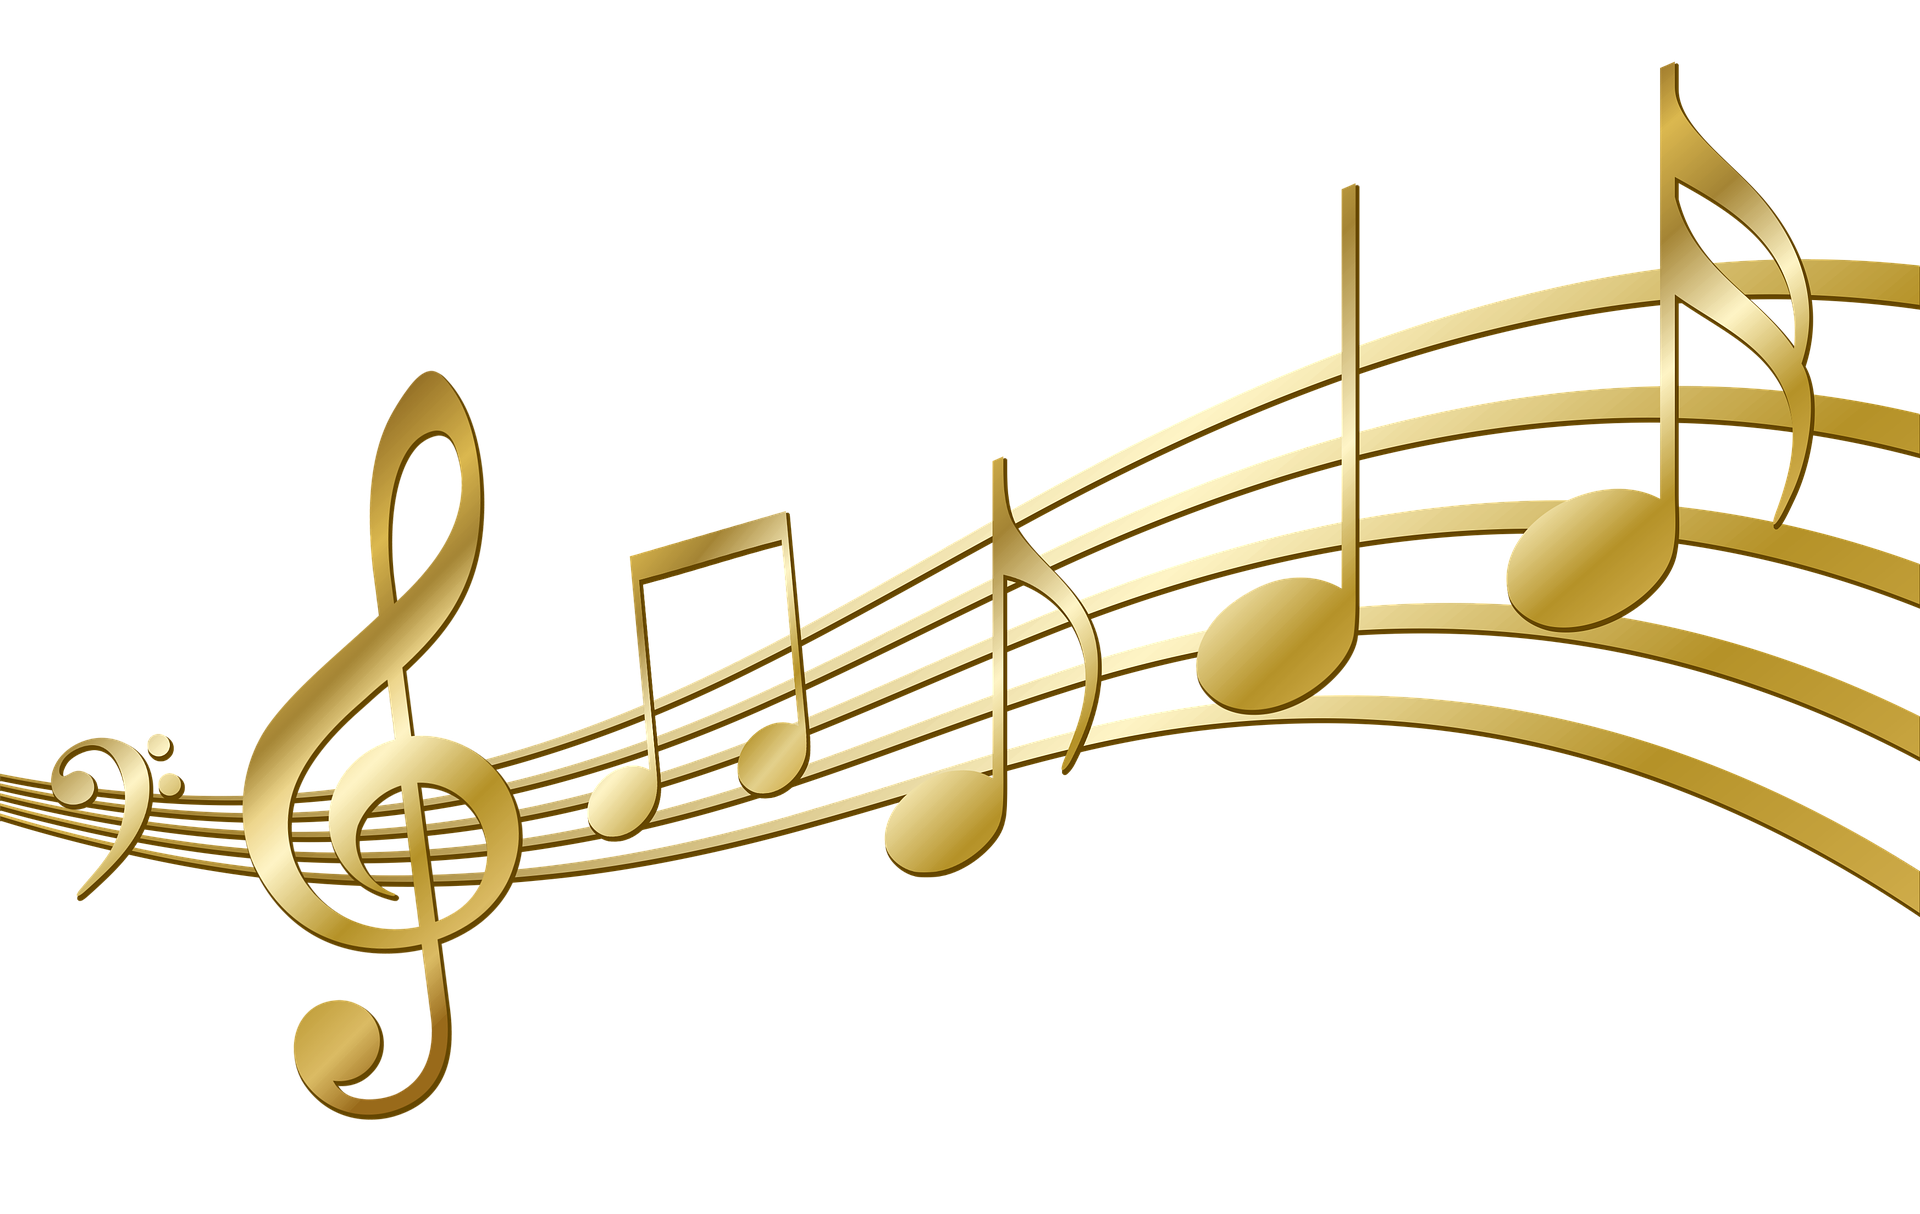 Рисунок скрипичная нота